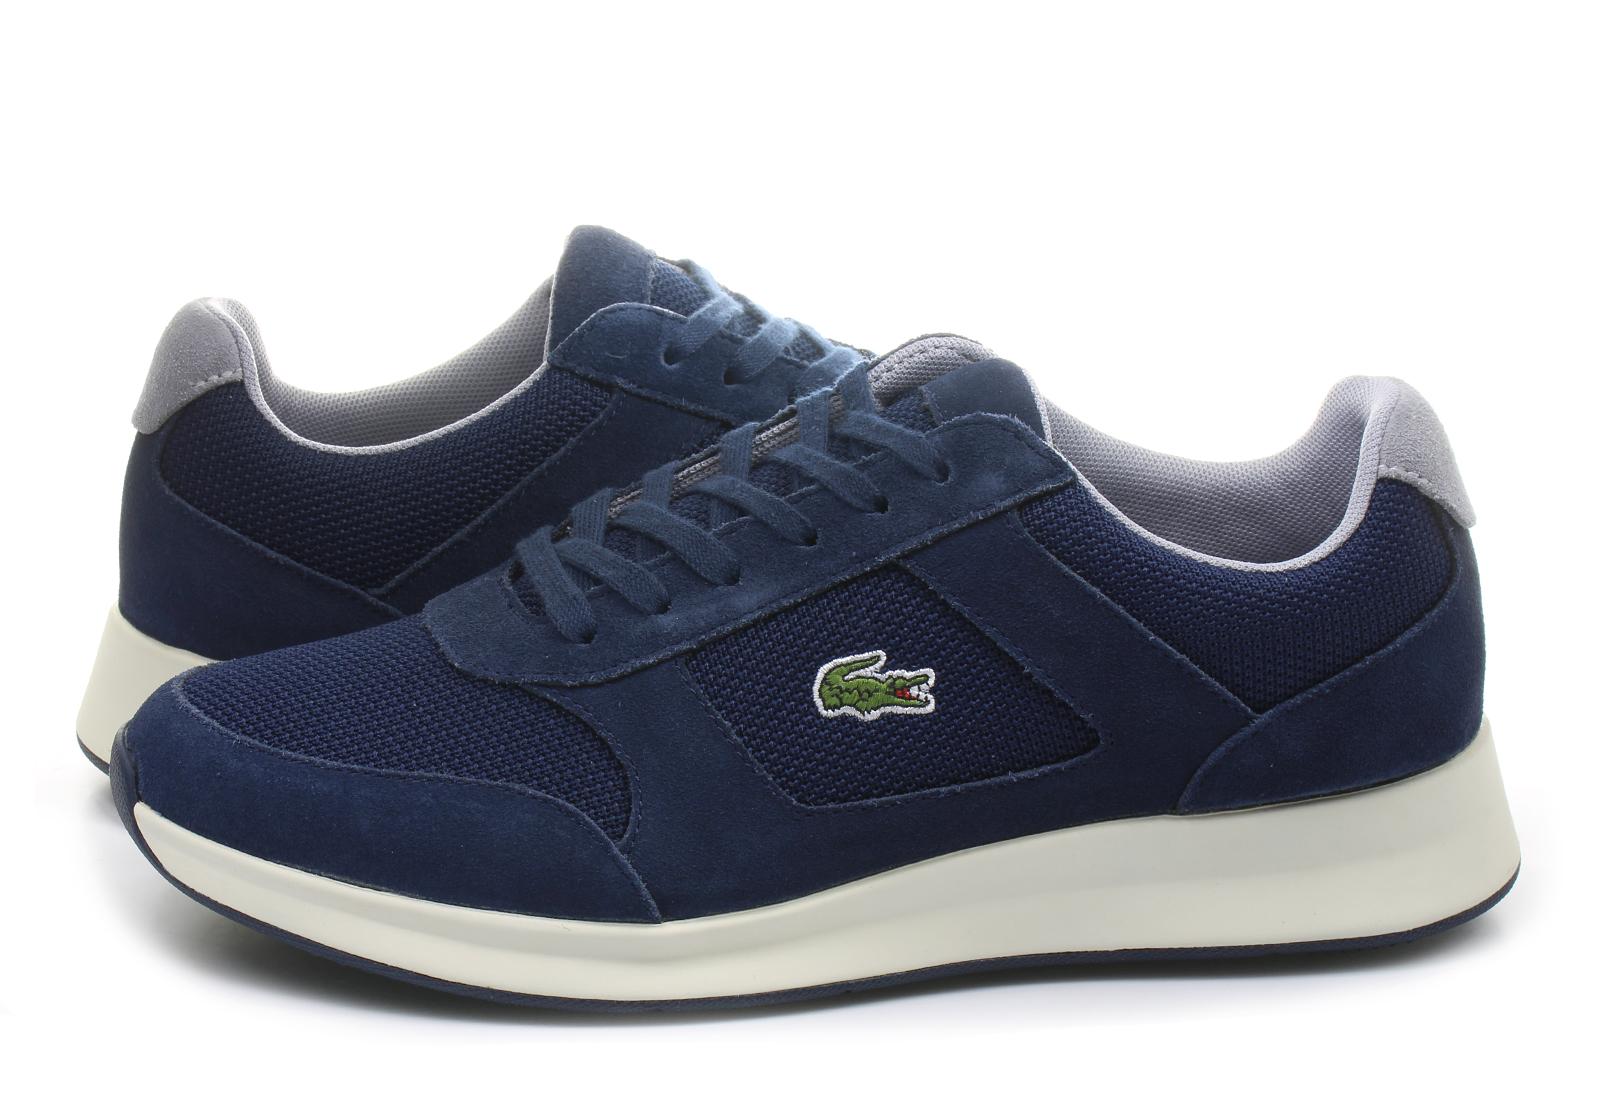 Lacoste Cipő - joggeur - 171spm1008-003 - Office Shoes Magyarország 0f8fef433b